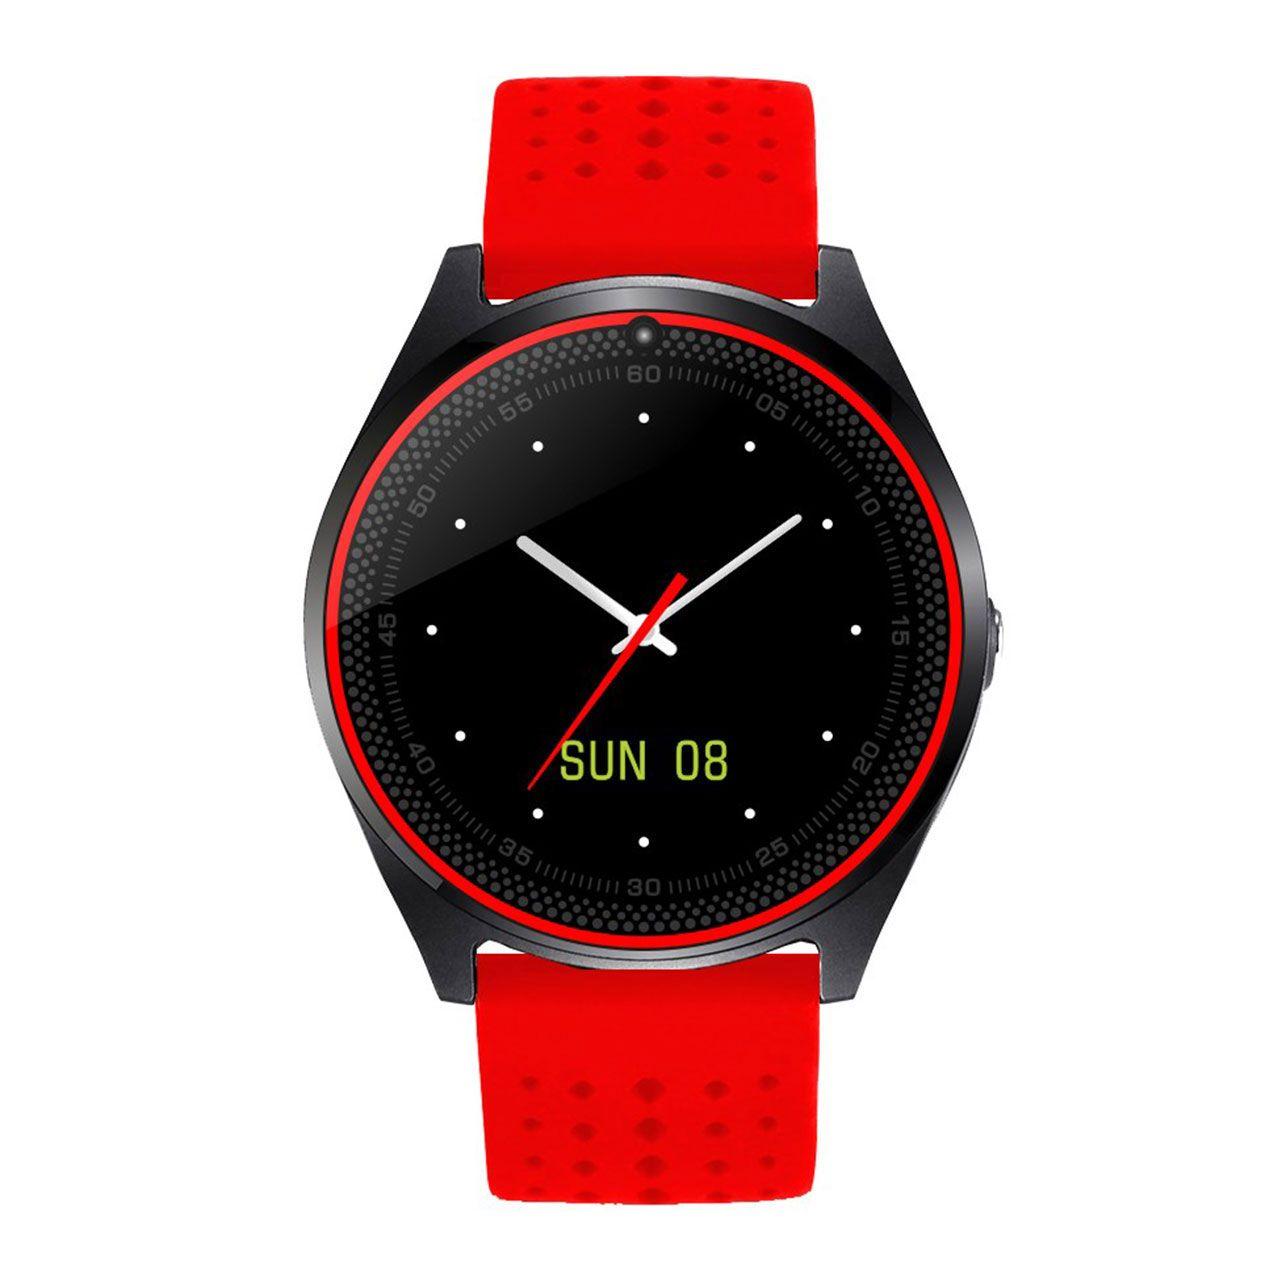 ساعت هوشمند مدل V9 main 1 4